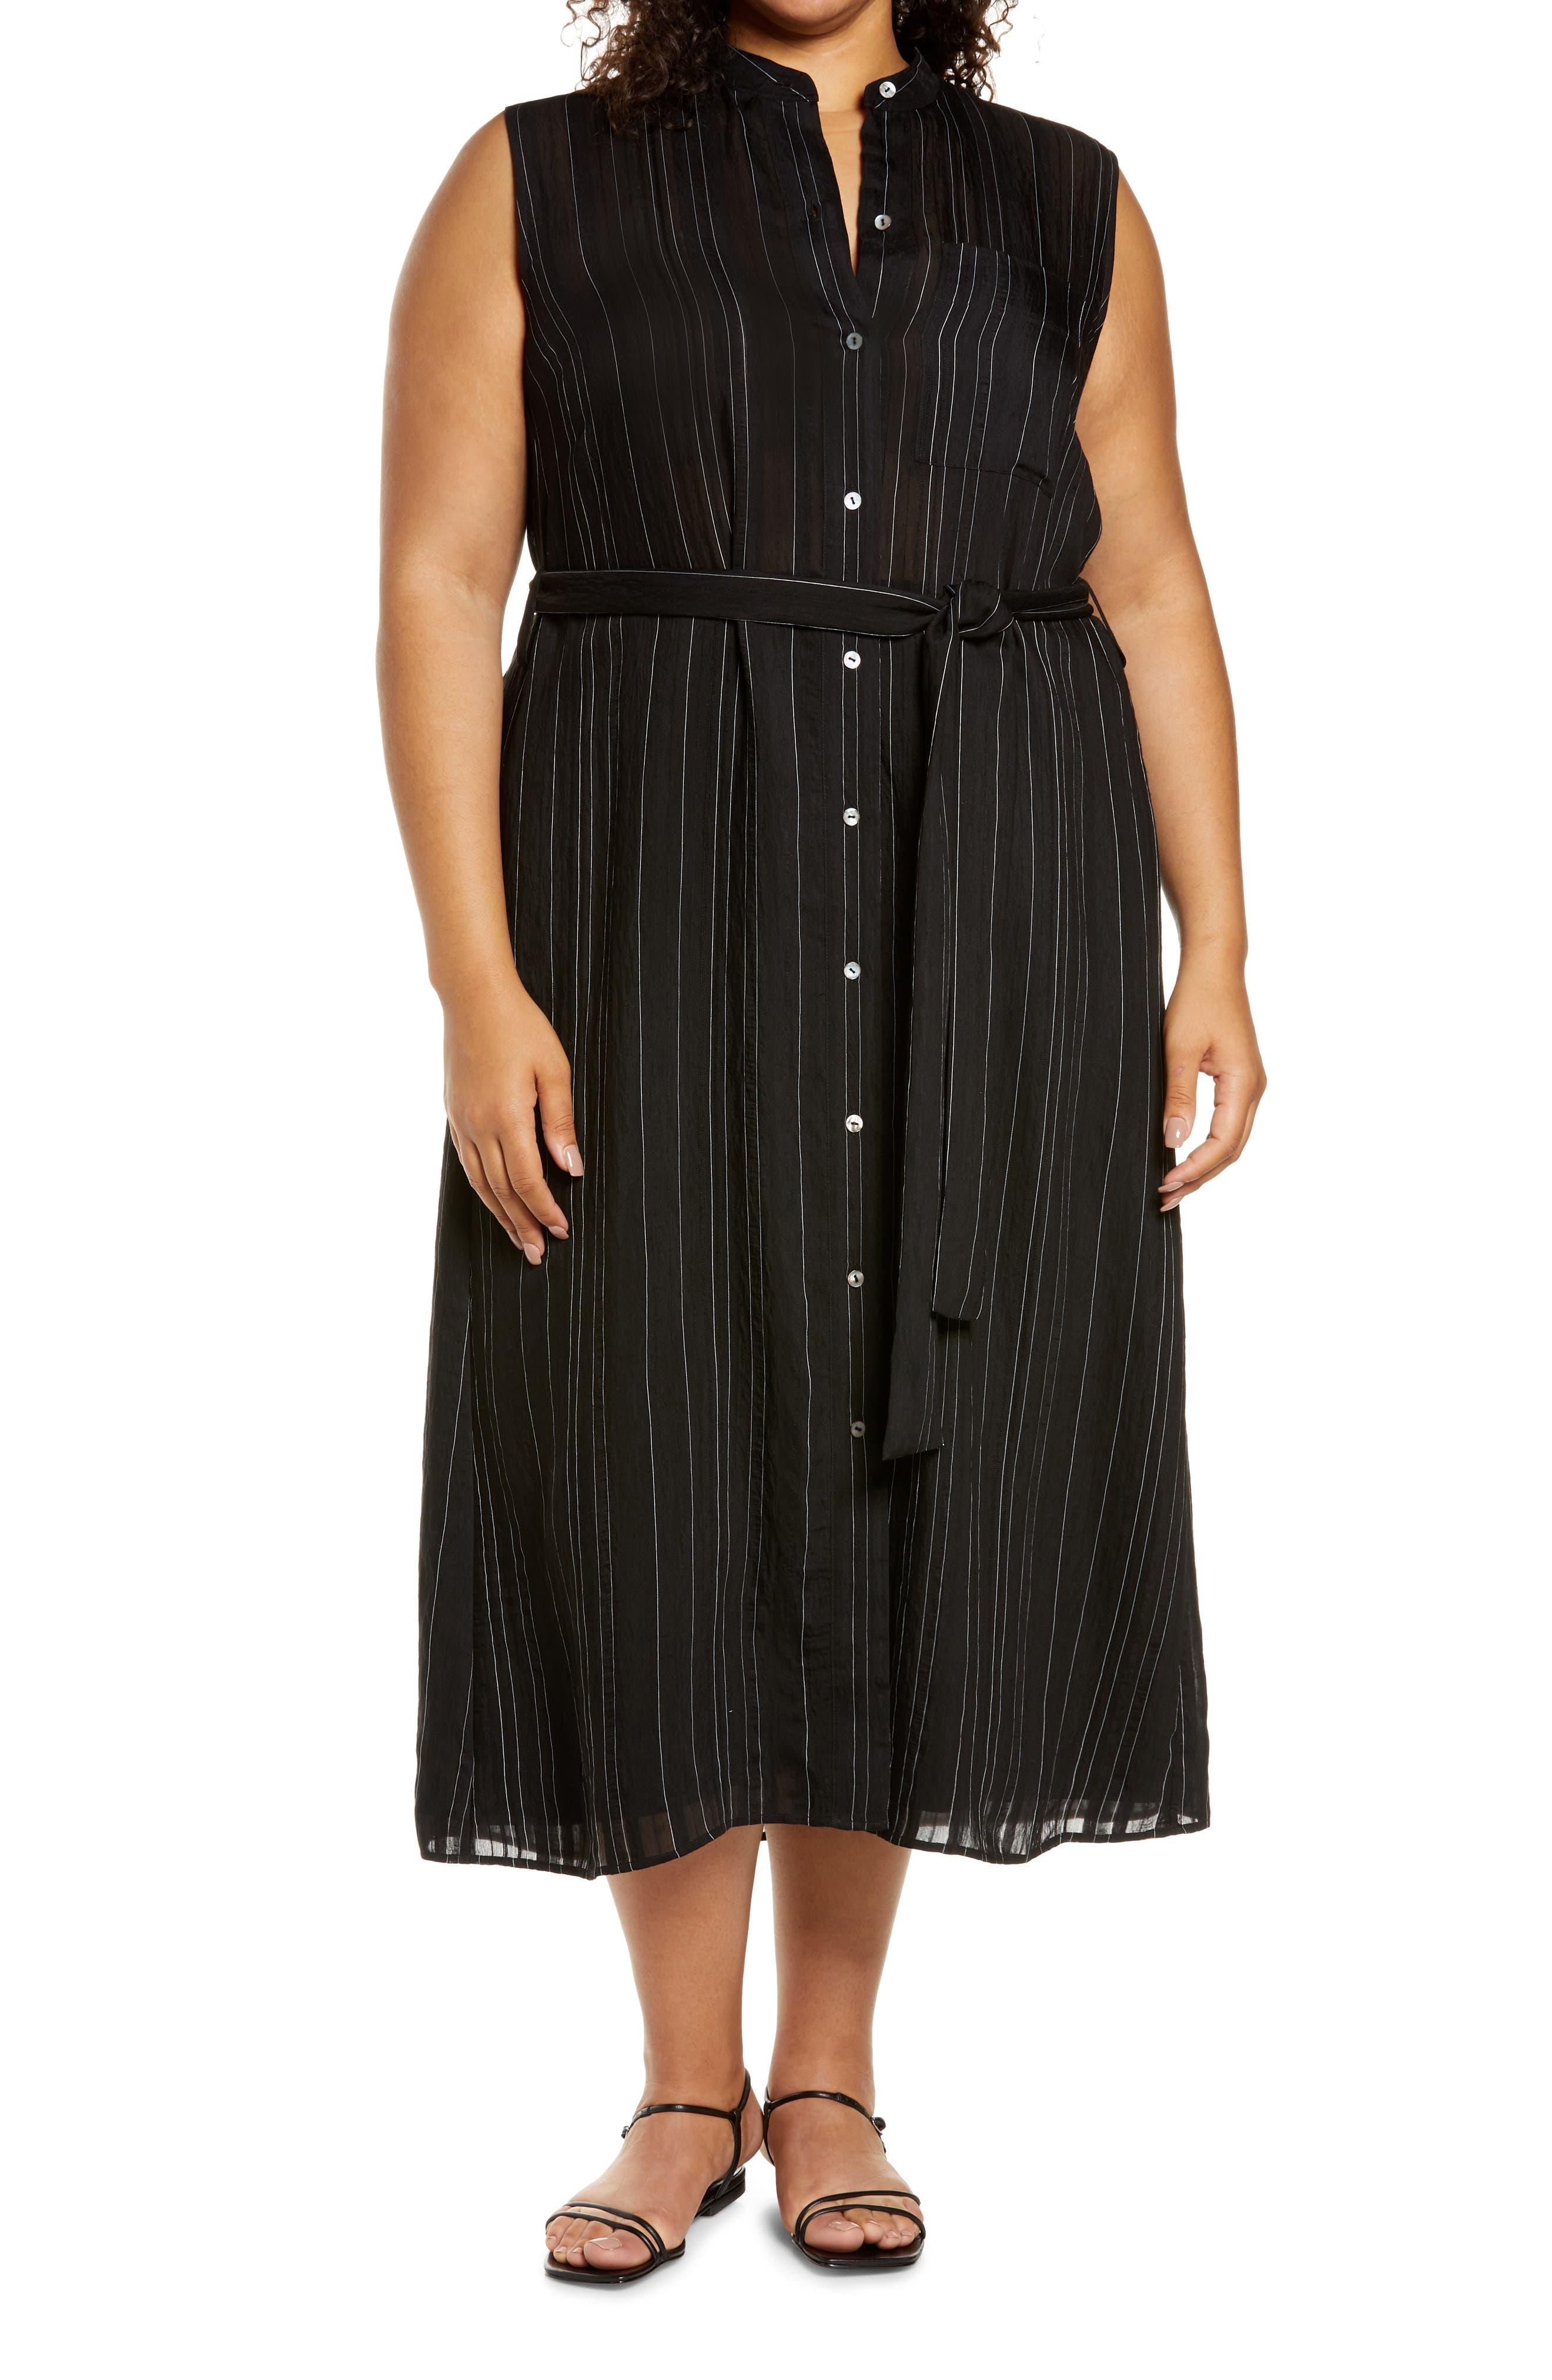 Shirtdress Plus-Size Dresses   Nordstrom